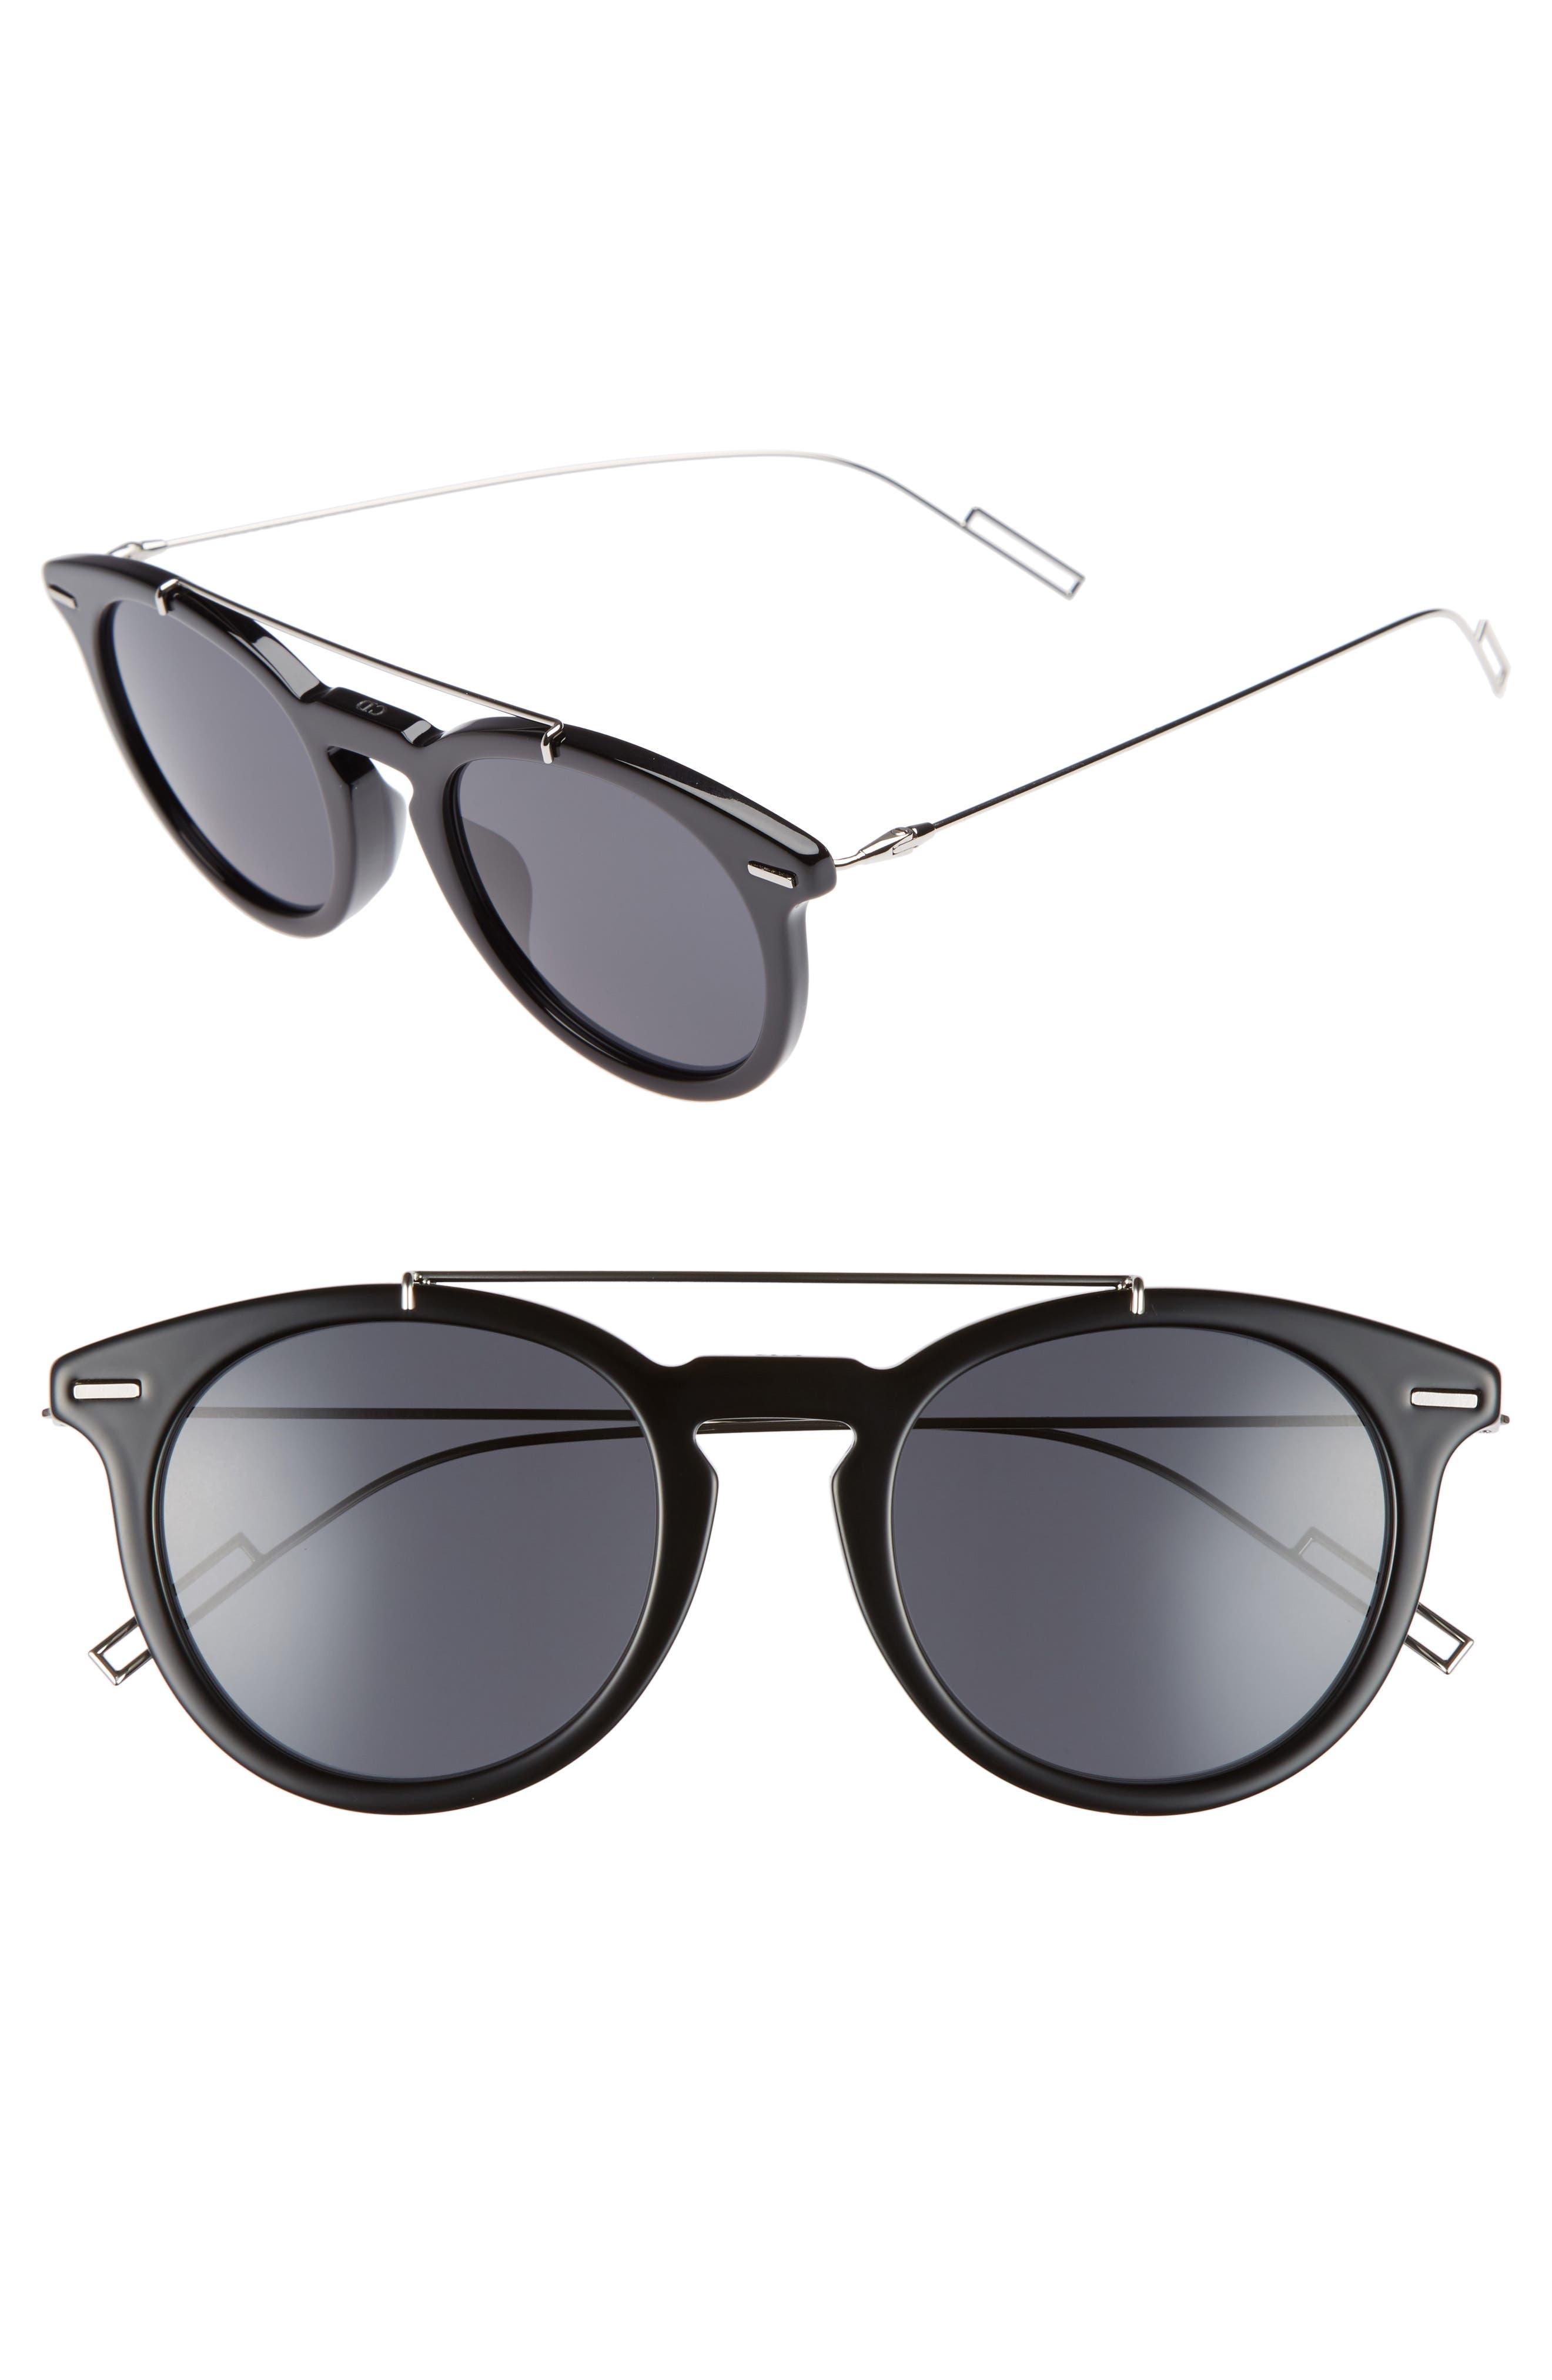 Master 51mm Sunglasses,                             Main thumbnail 1, color,                             BLACK